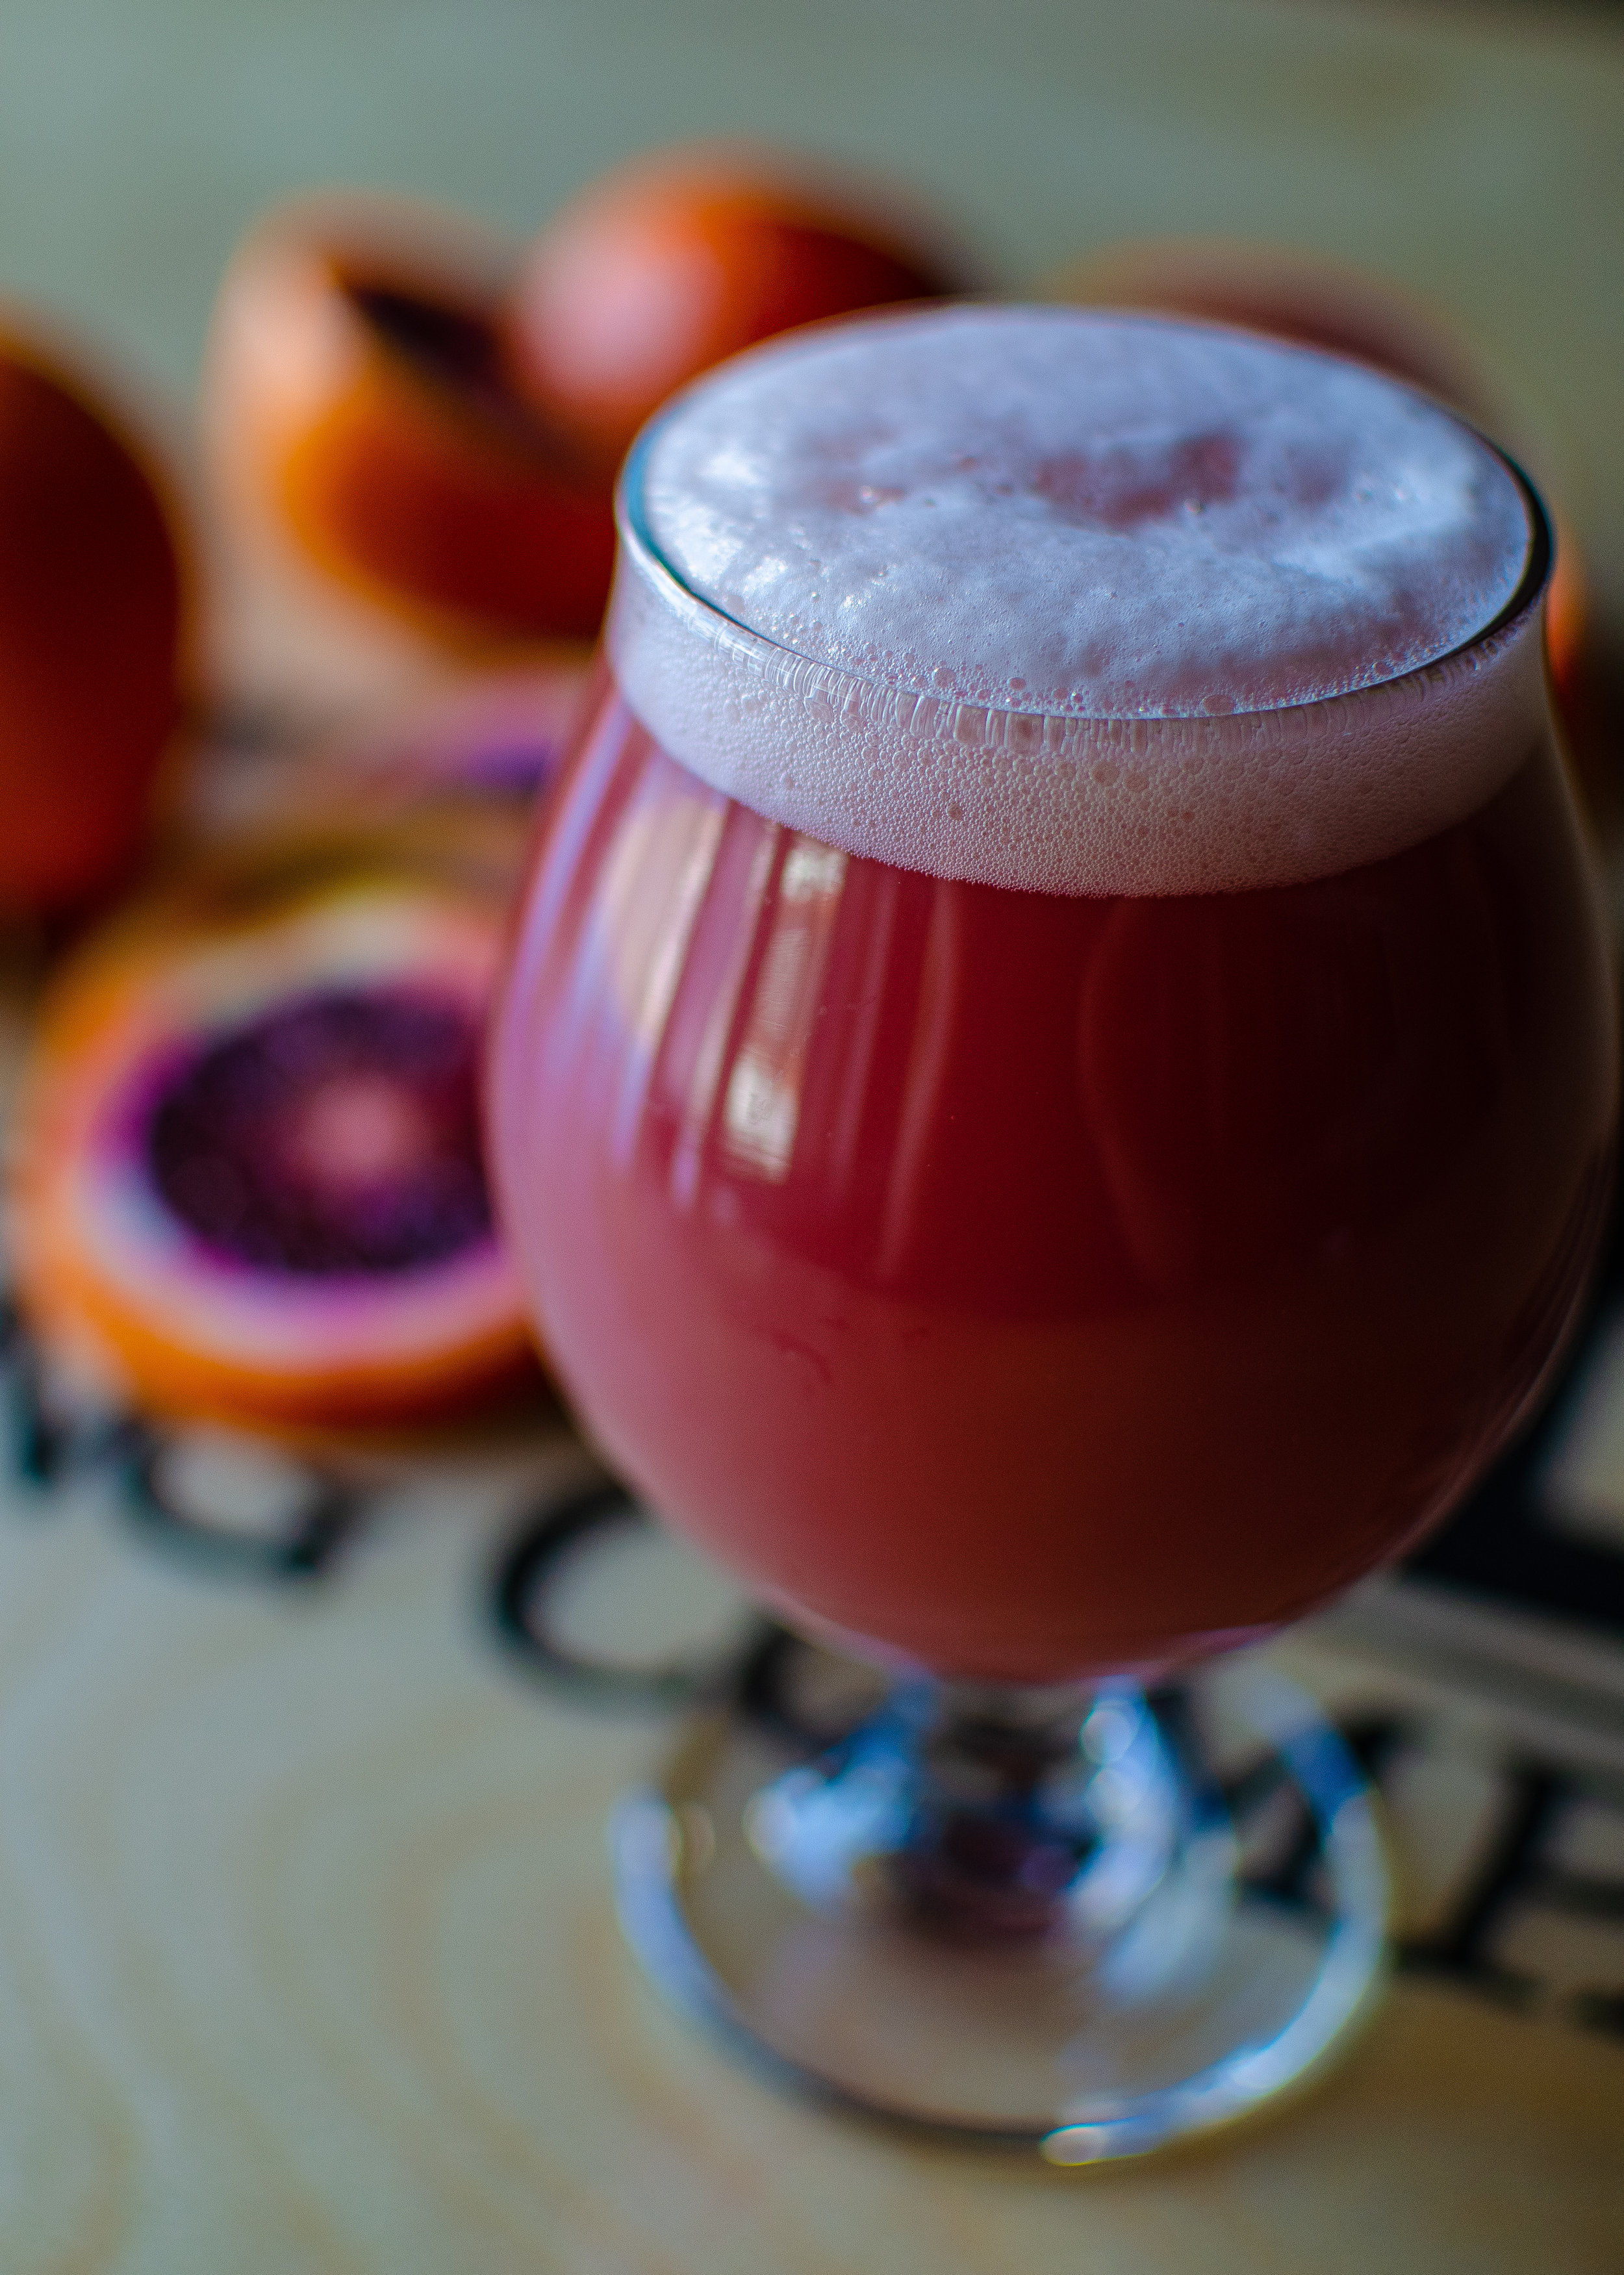 Fresh Blood, DIPA, 7.9% - Brewed with blood orange and Japanese Yuzu for big fruity, orange citrus character